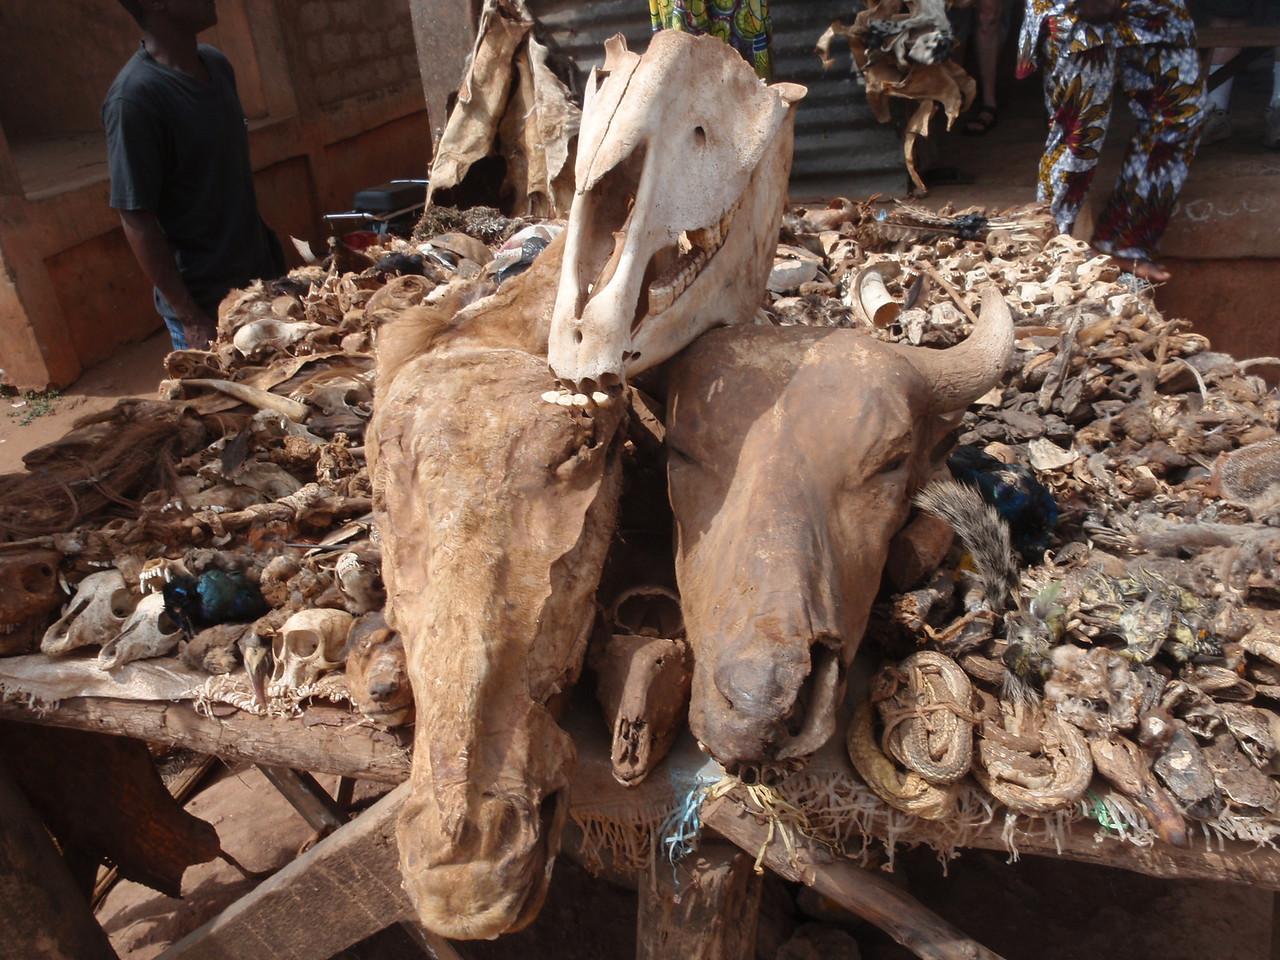 135_Abomey-Calavi Fetish Market  Raw Materials for Intervention